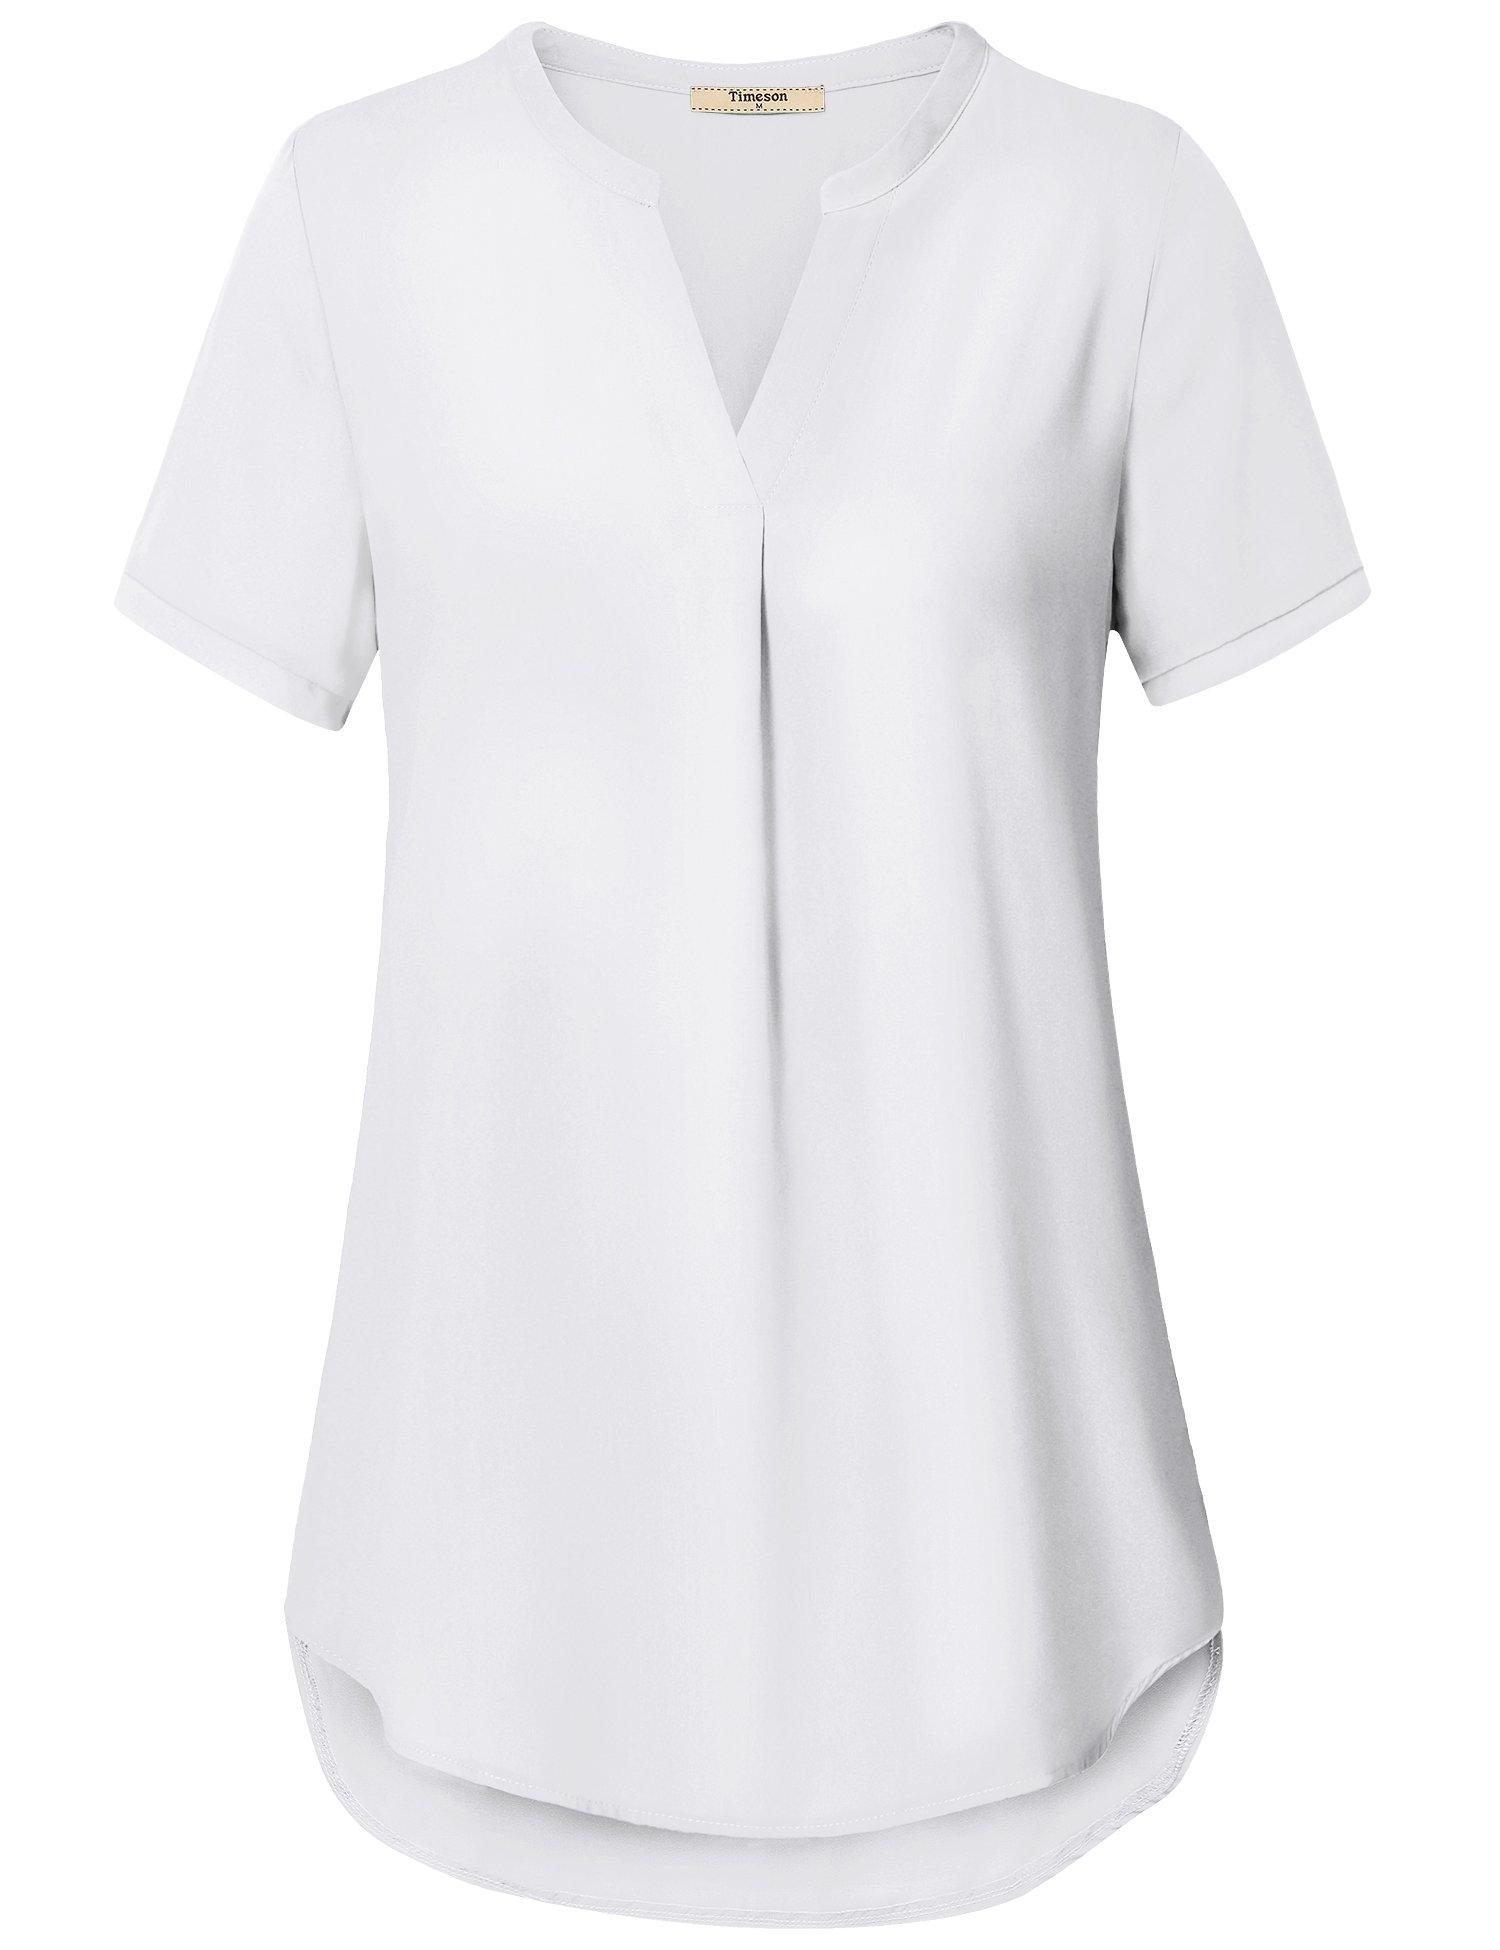 Timeson Womens Blouses Tops Work, Women's V Neck Short Sleeve Casual Chiffon Henley Tunic Blouses Tops White Medium